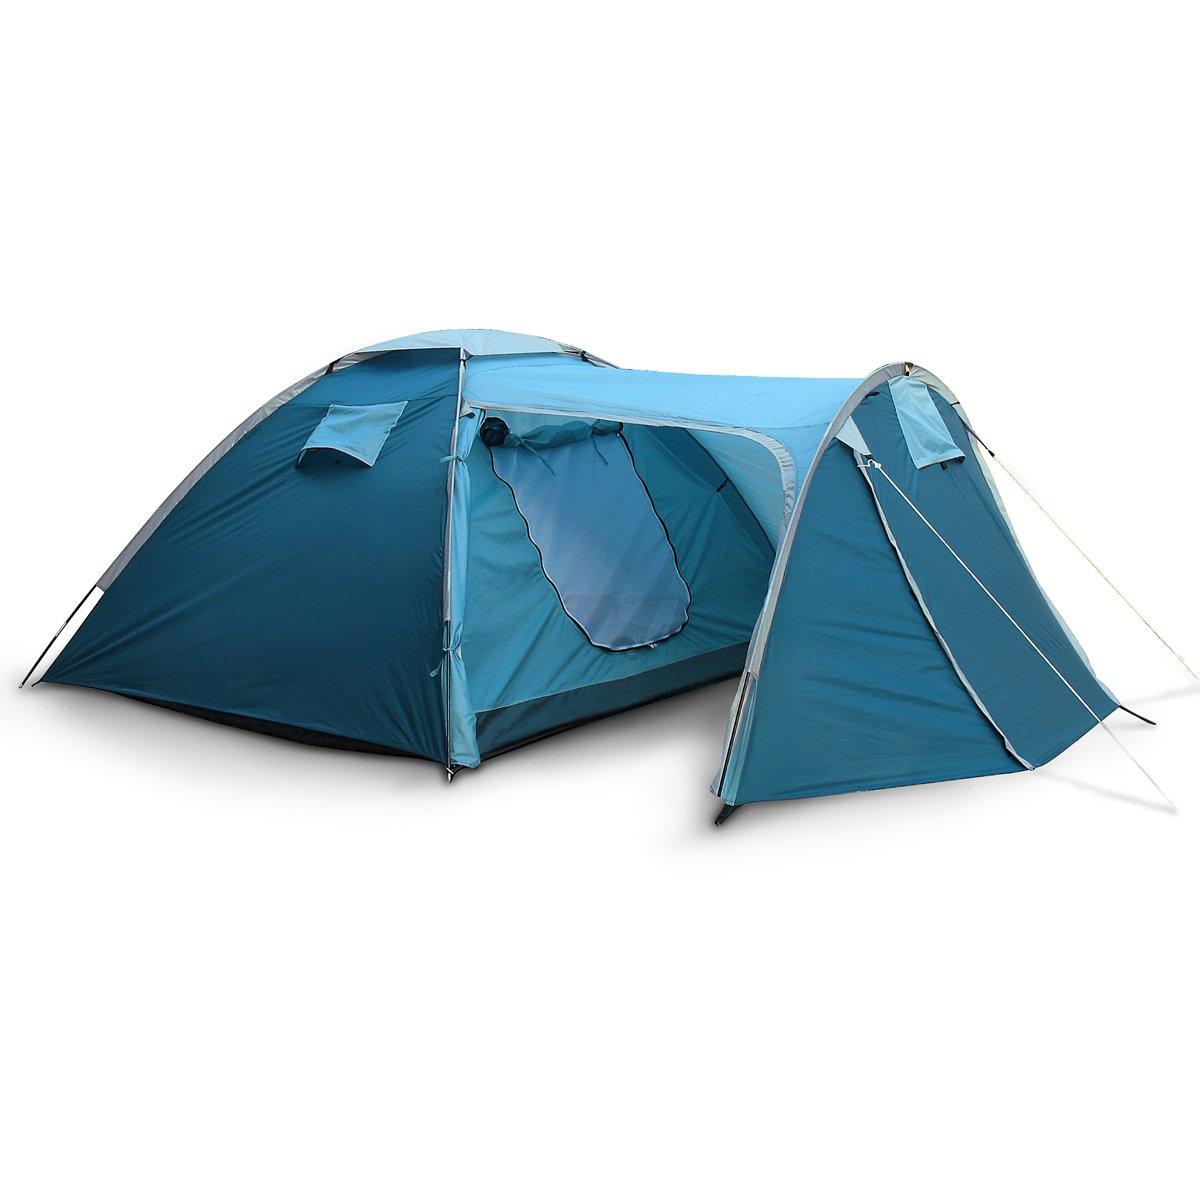 Familien Zelt aus Polyester Maße: 130 + 210 x 240 x 140/120 cm